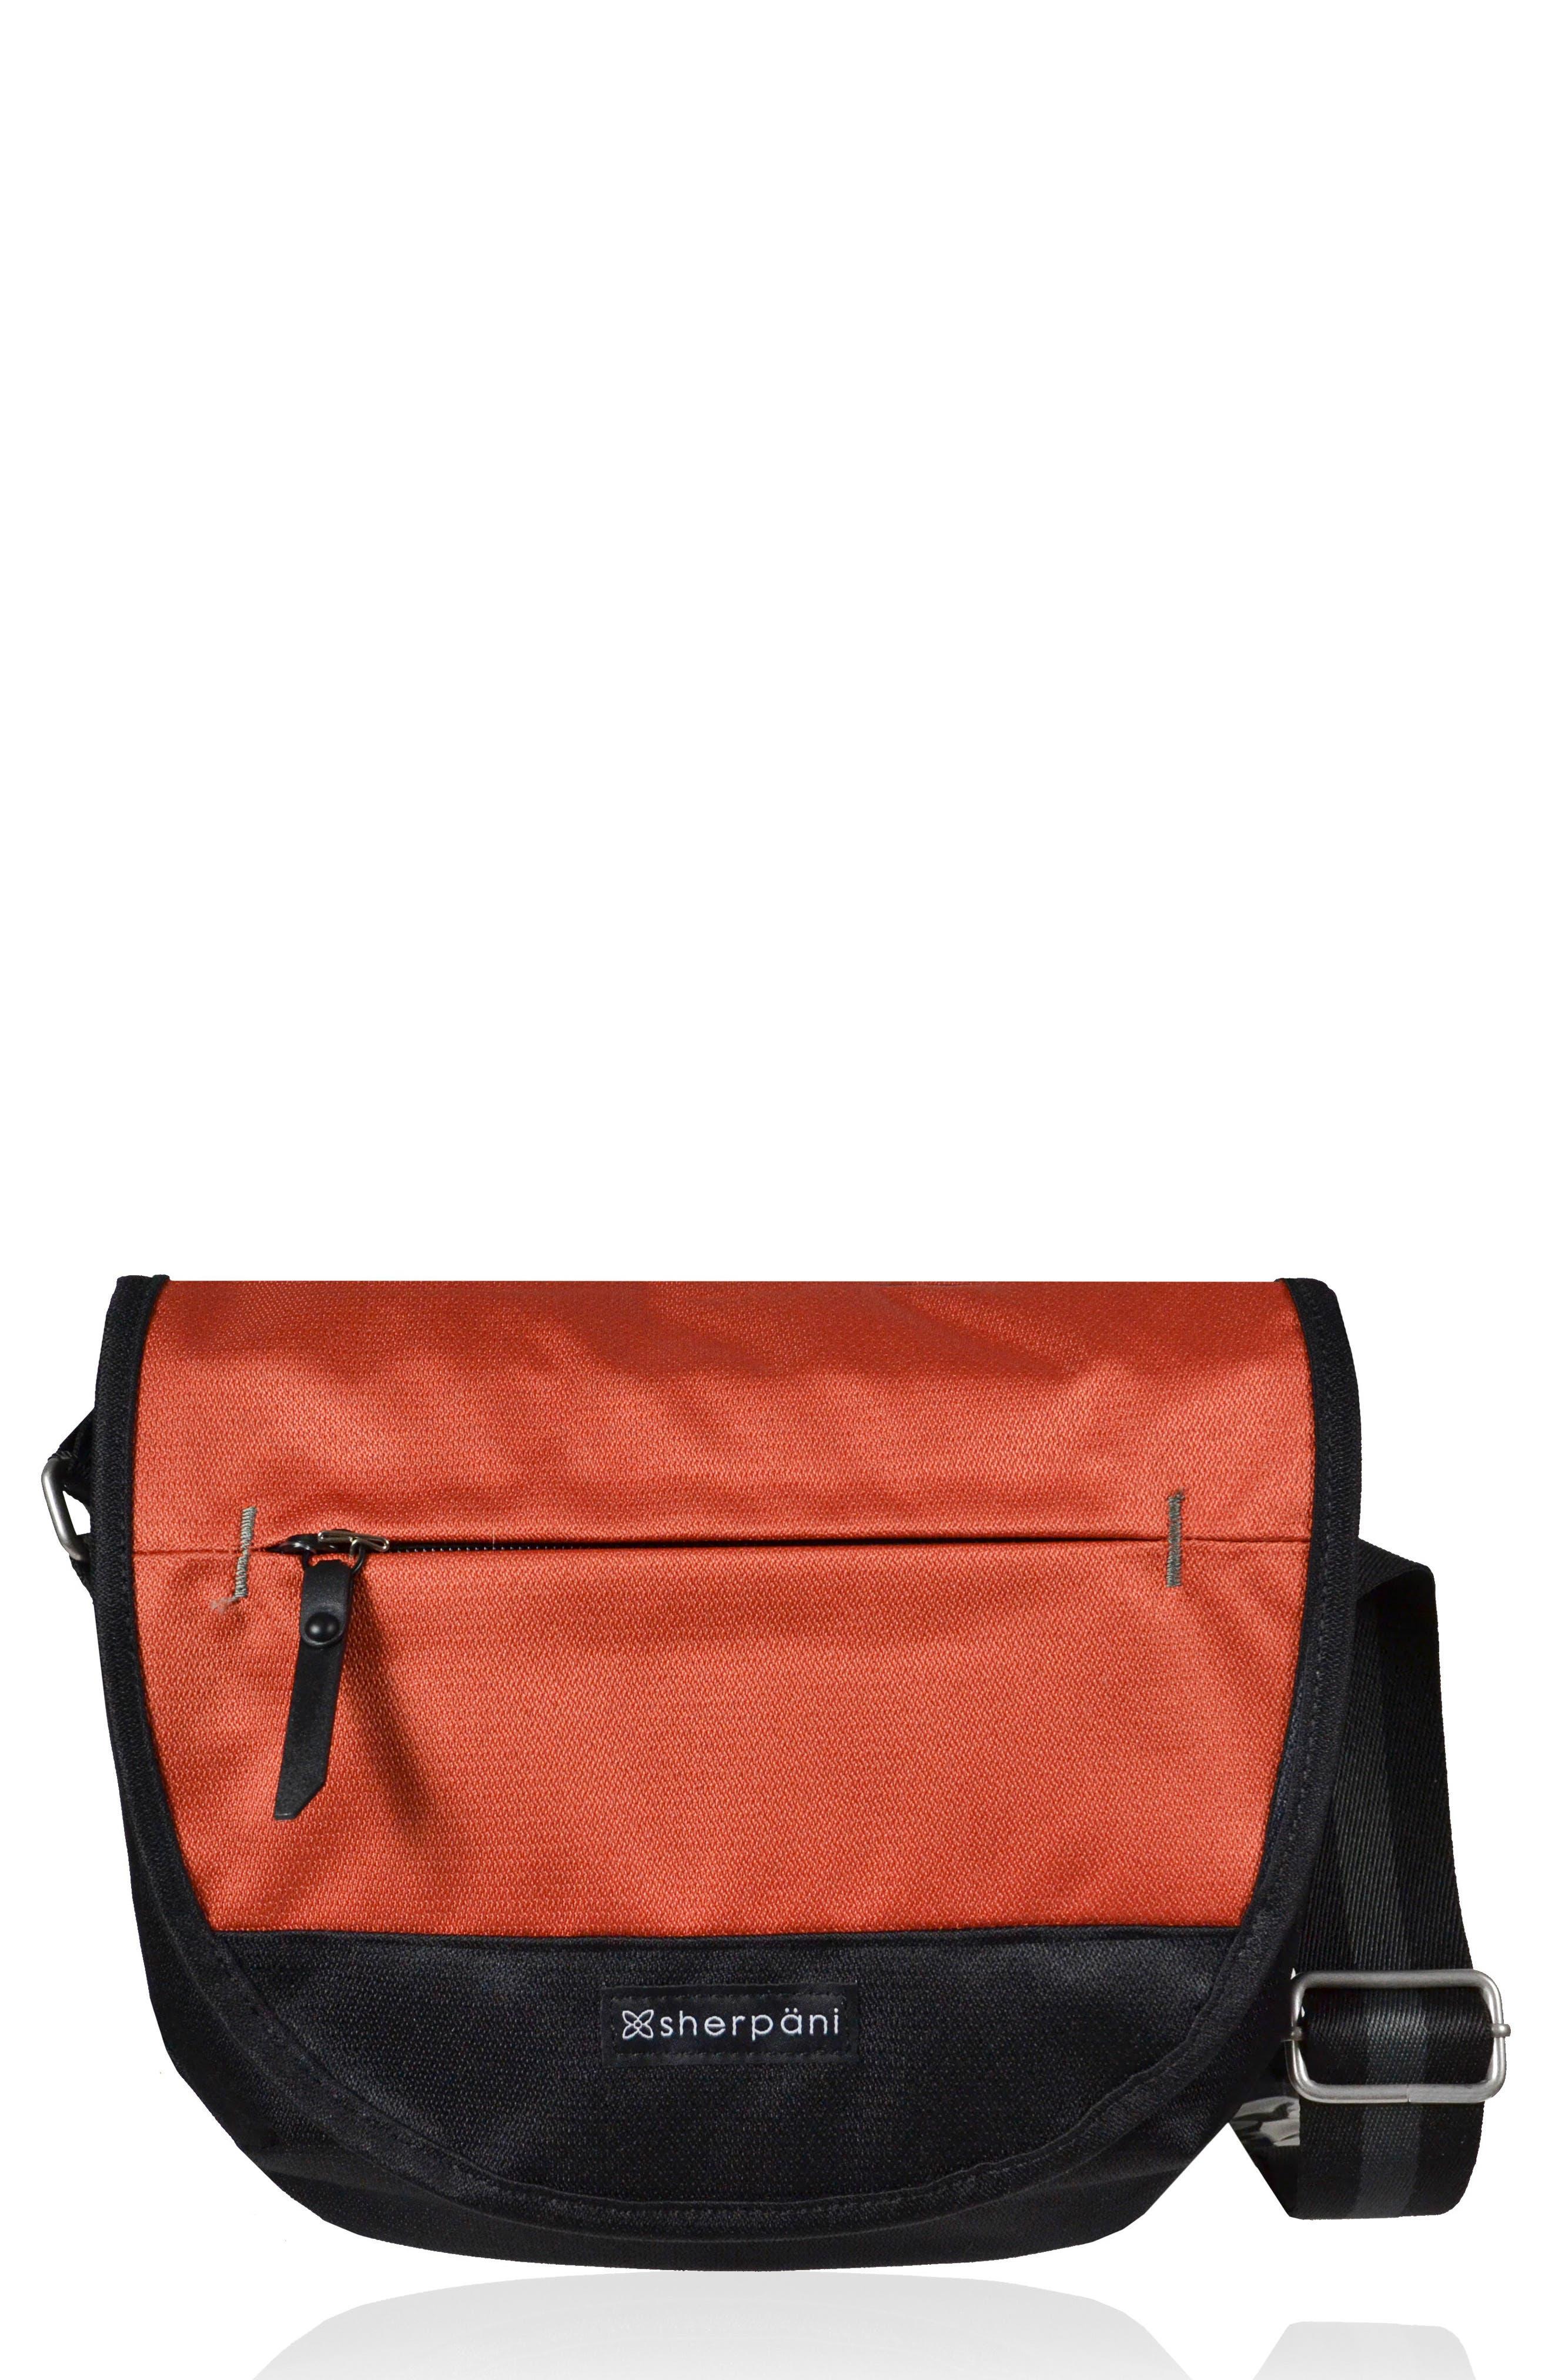 Main Image - Sherpani Milli Water Resistant RFID Pocket Messenger Bag